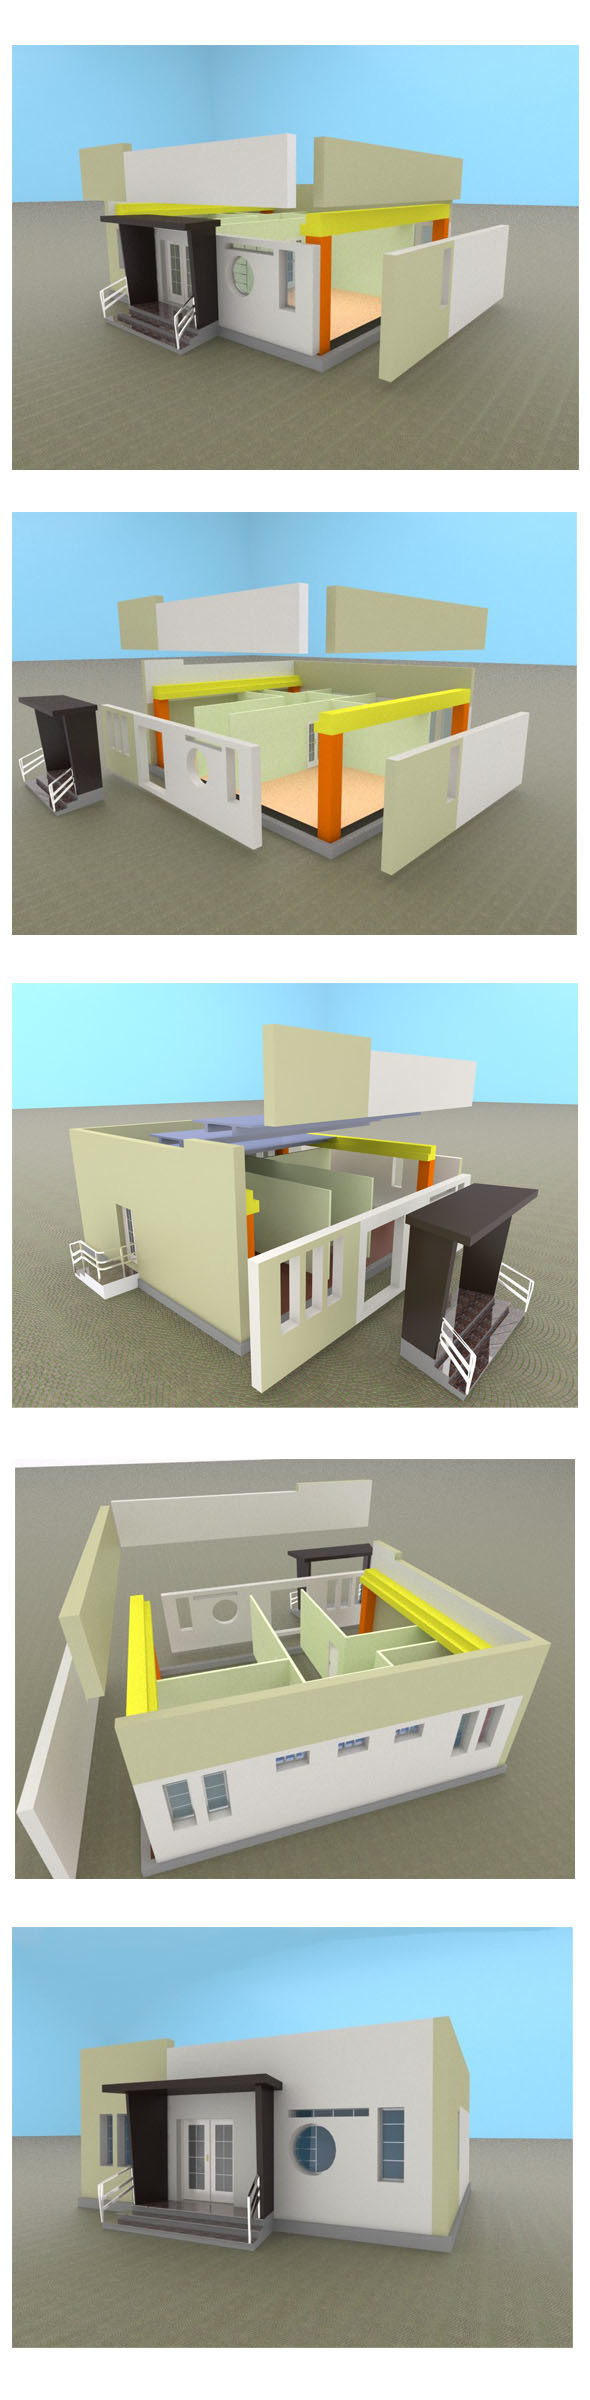 Modern precasted house - 3DOcean Item for Sale